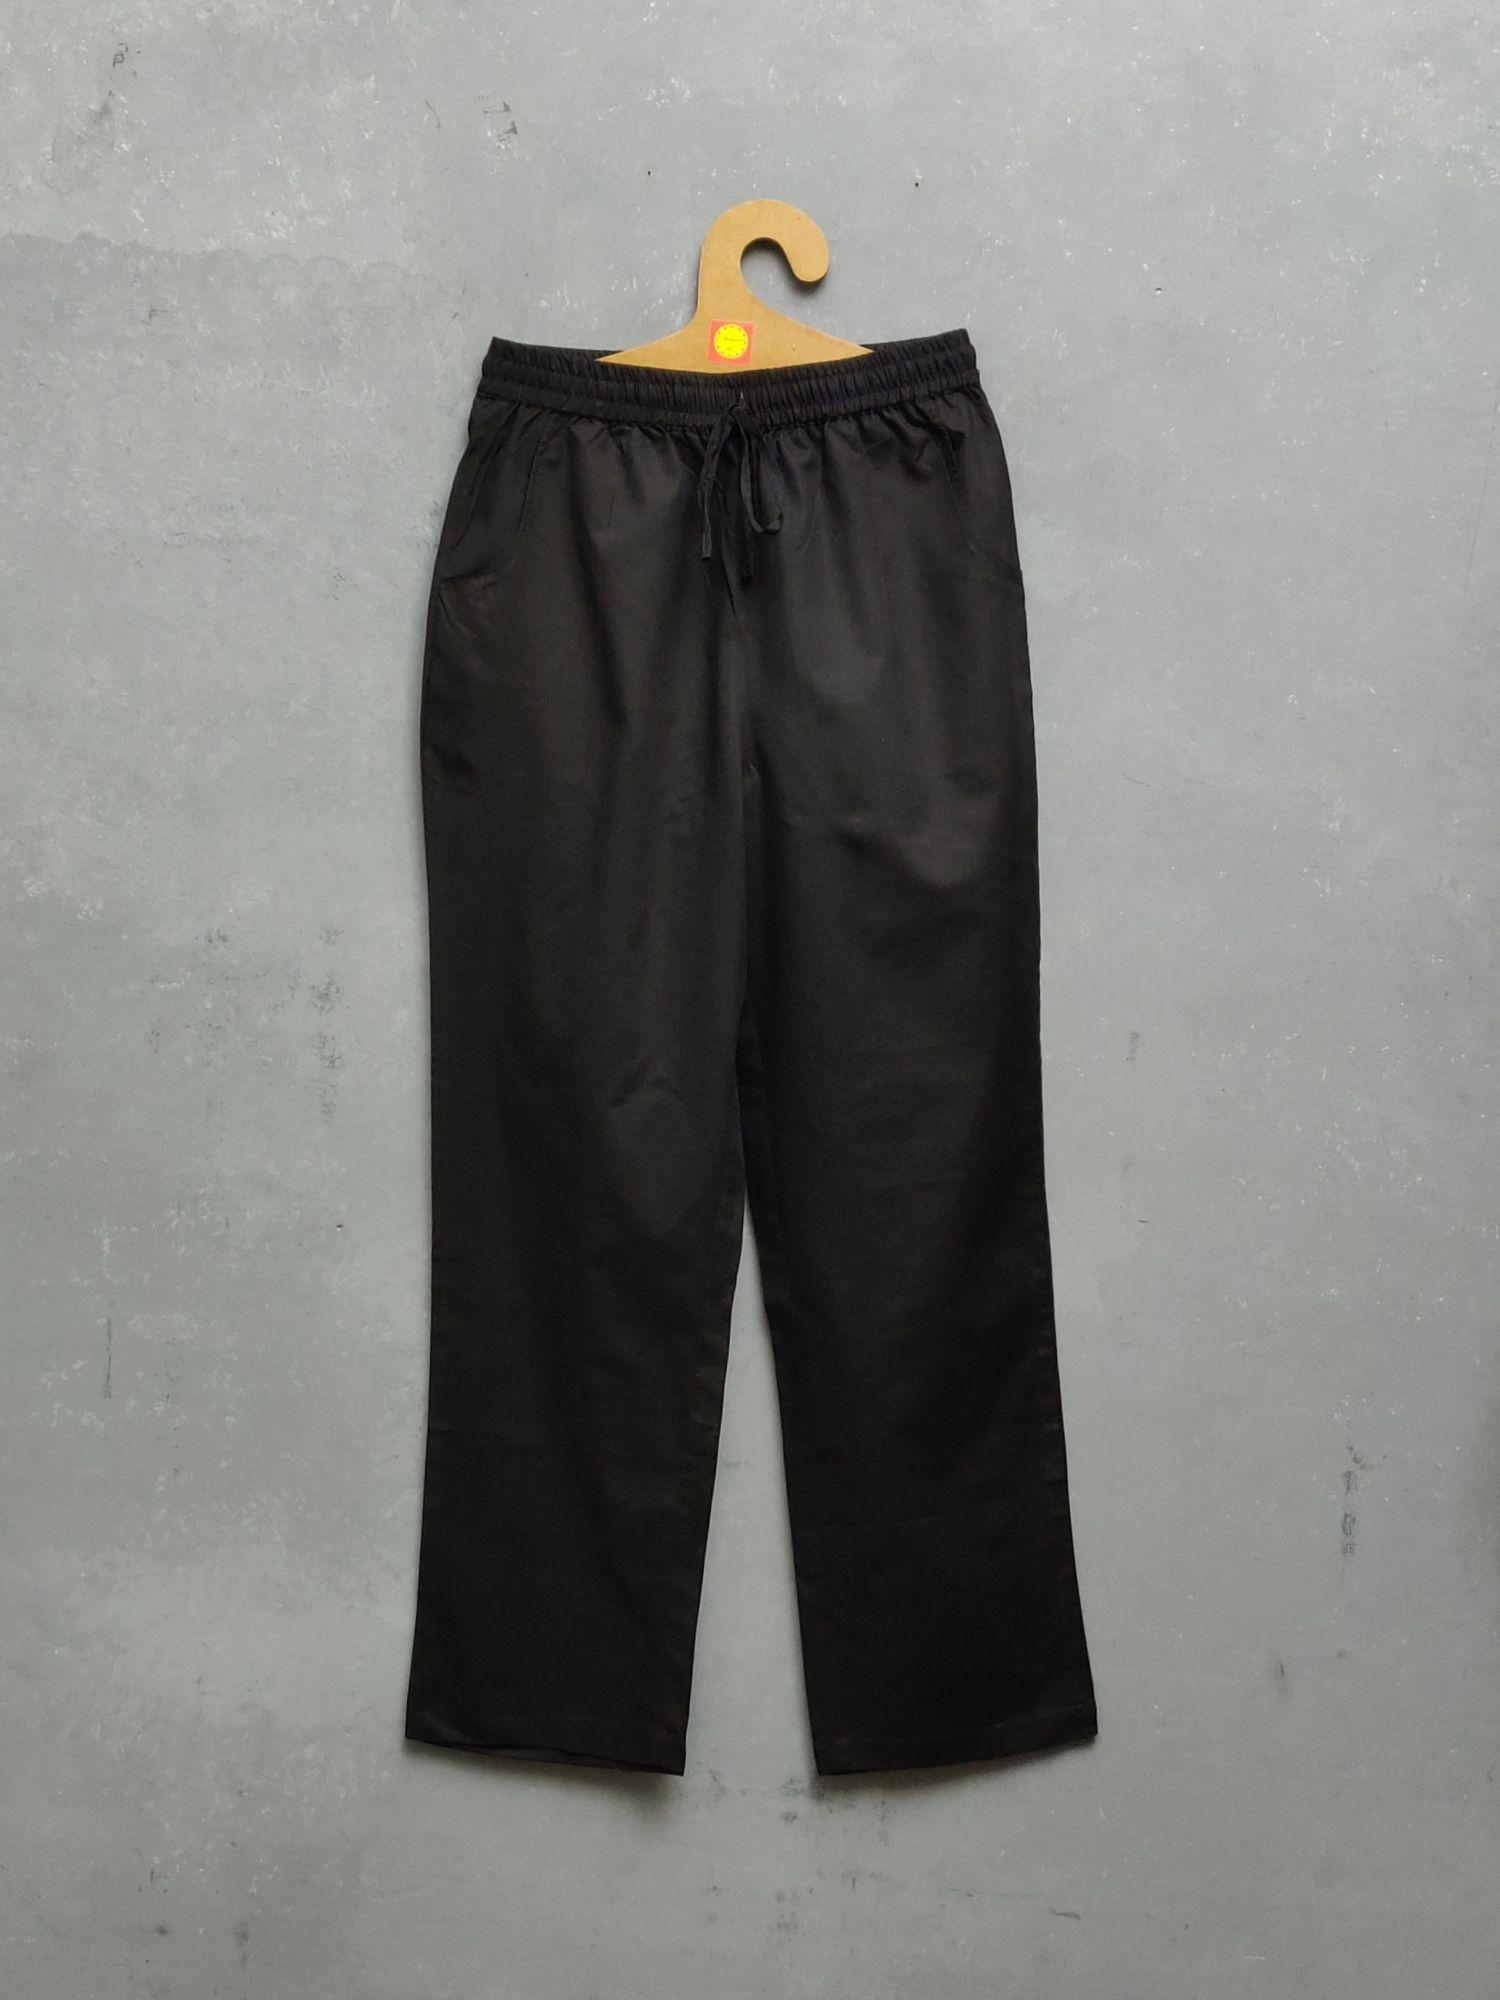 Black Colour Pyjamas / Pants